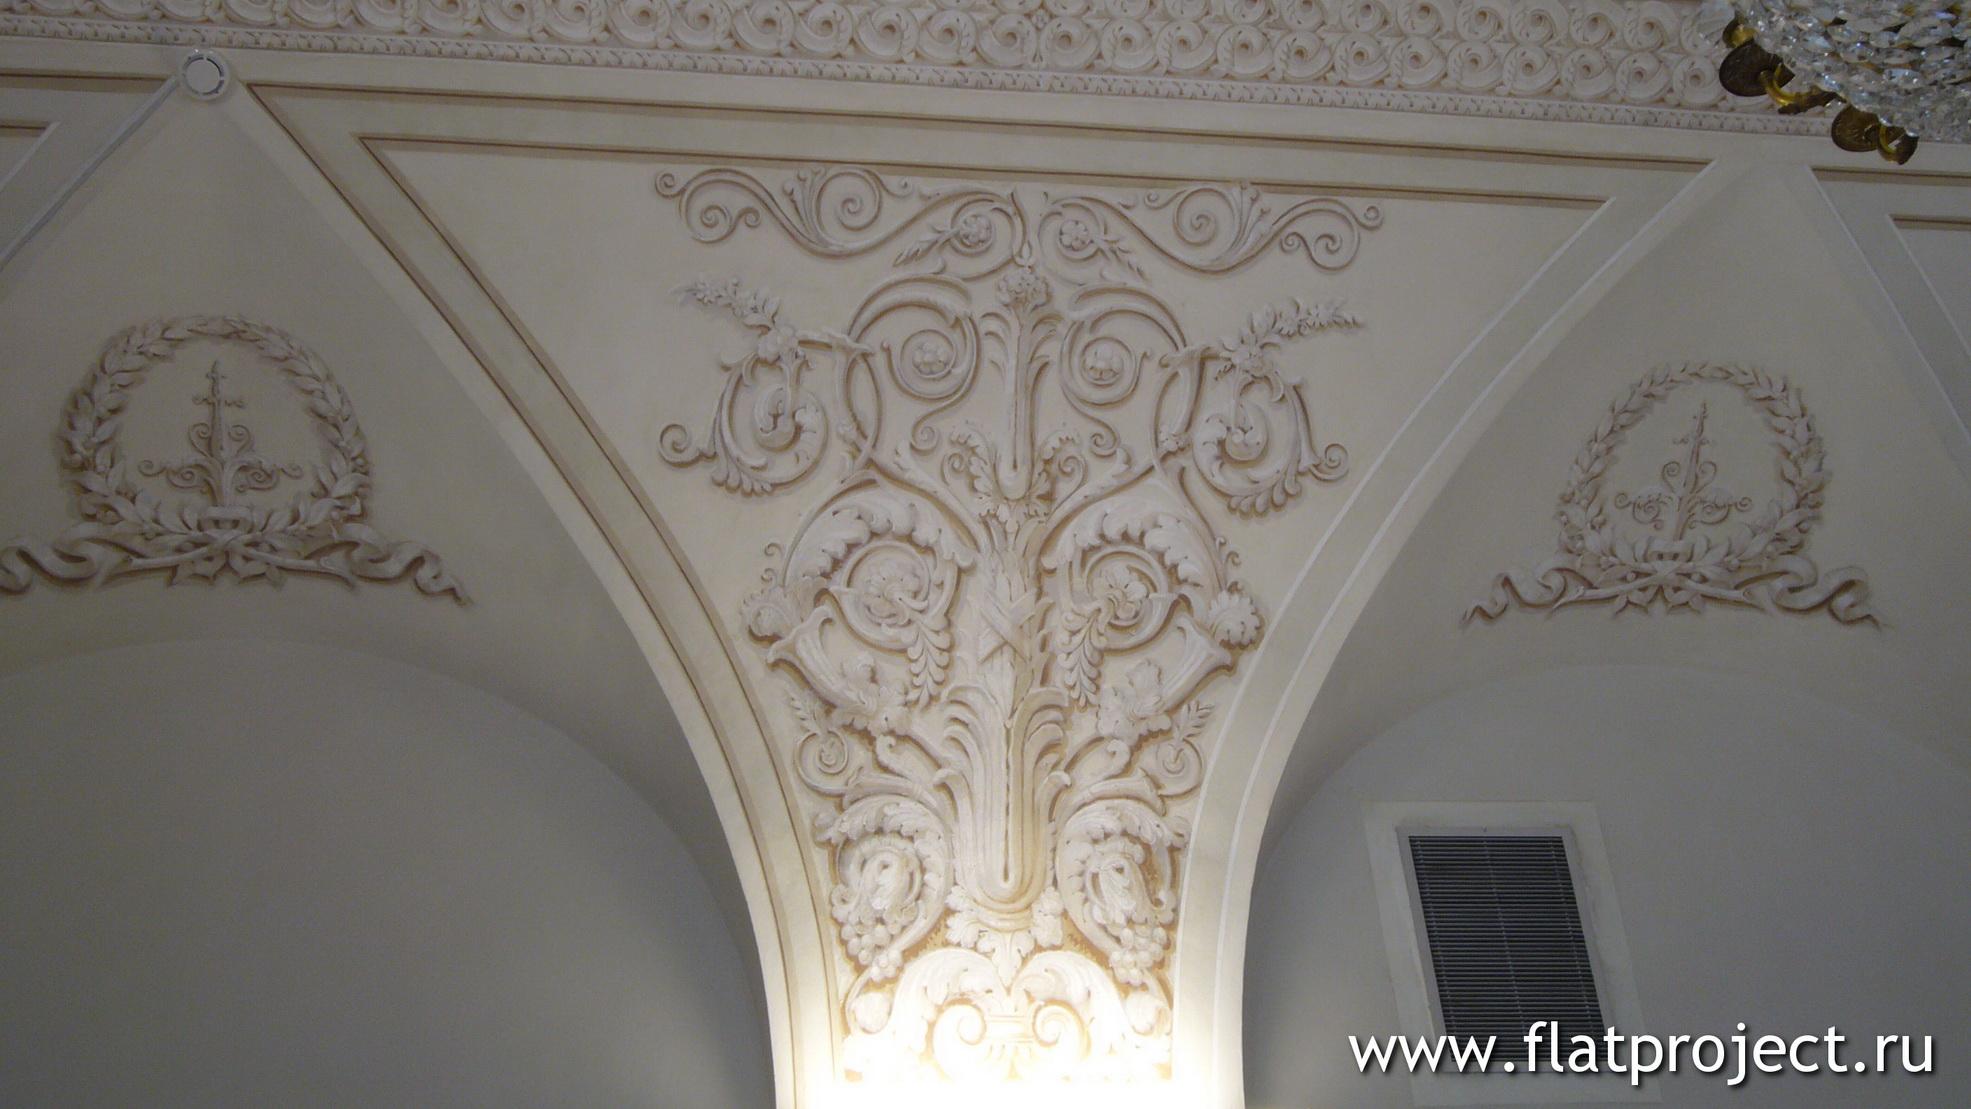 The State Hermitage museum interiors – photo 283